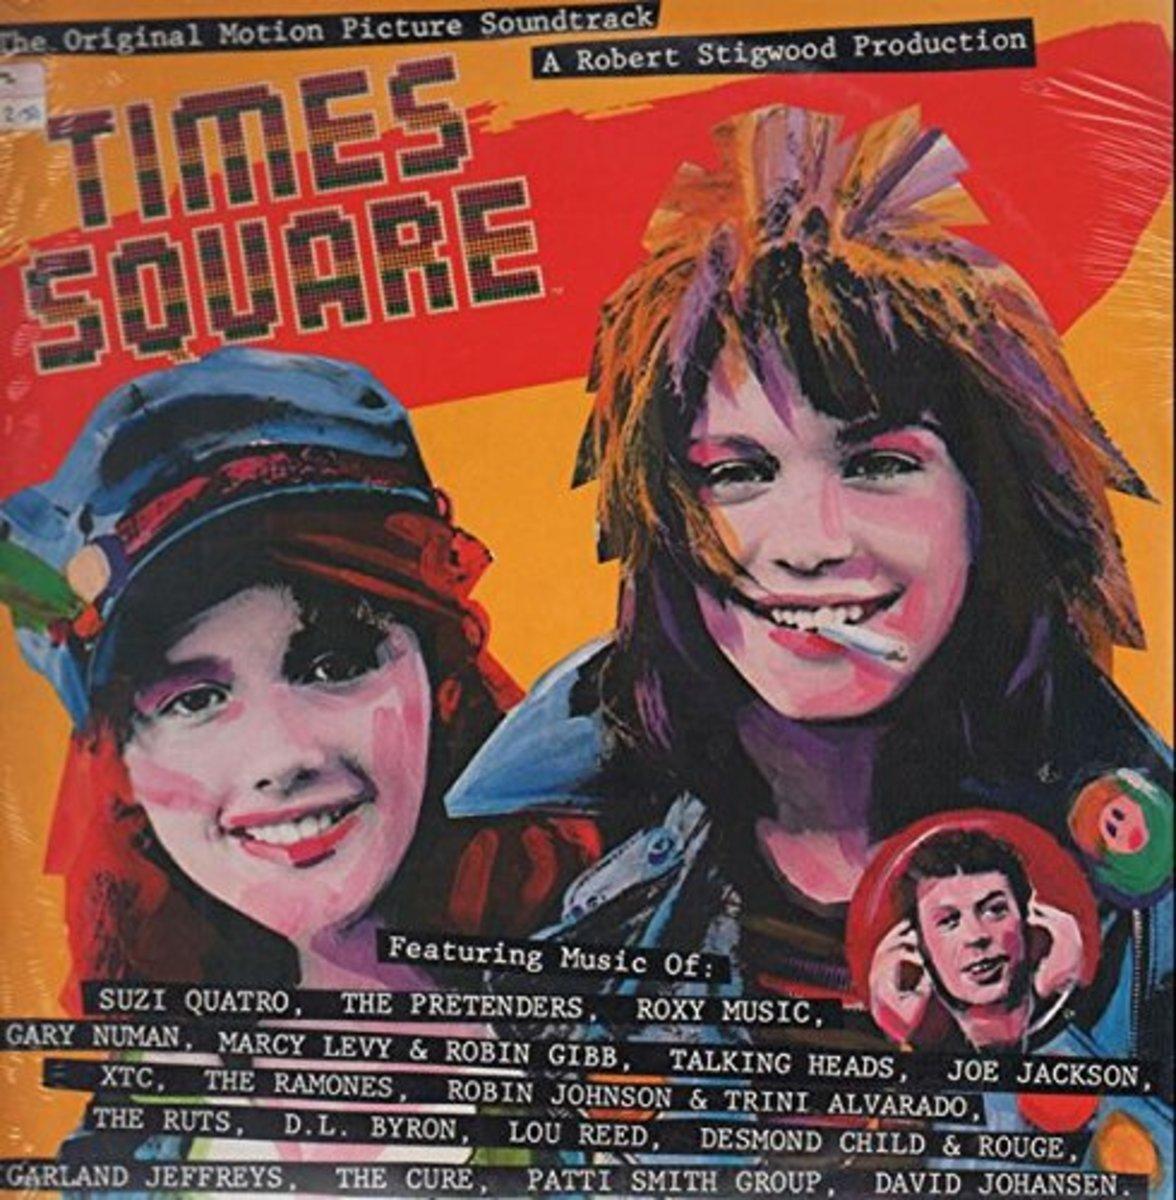 The soundtrack album for Times Square